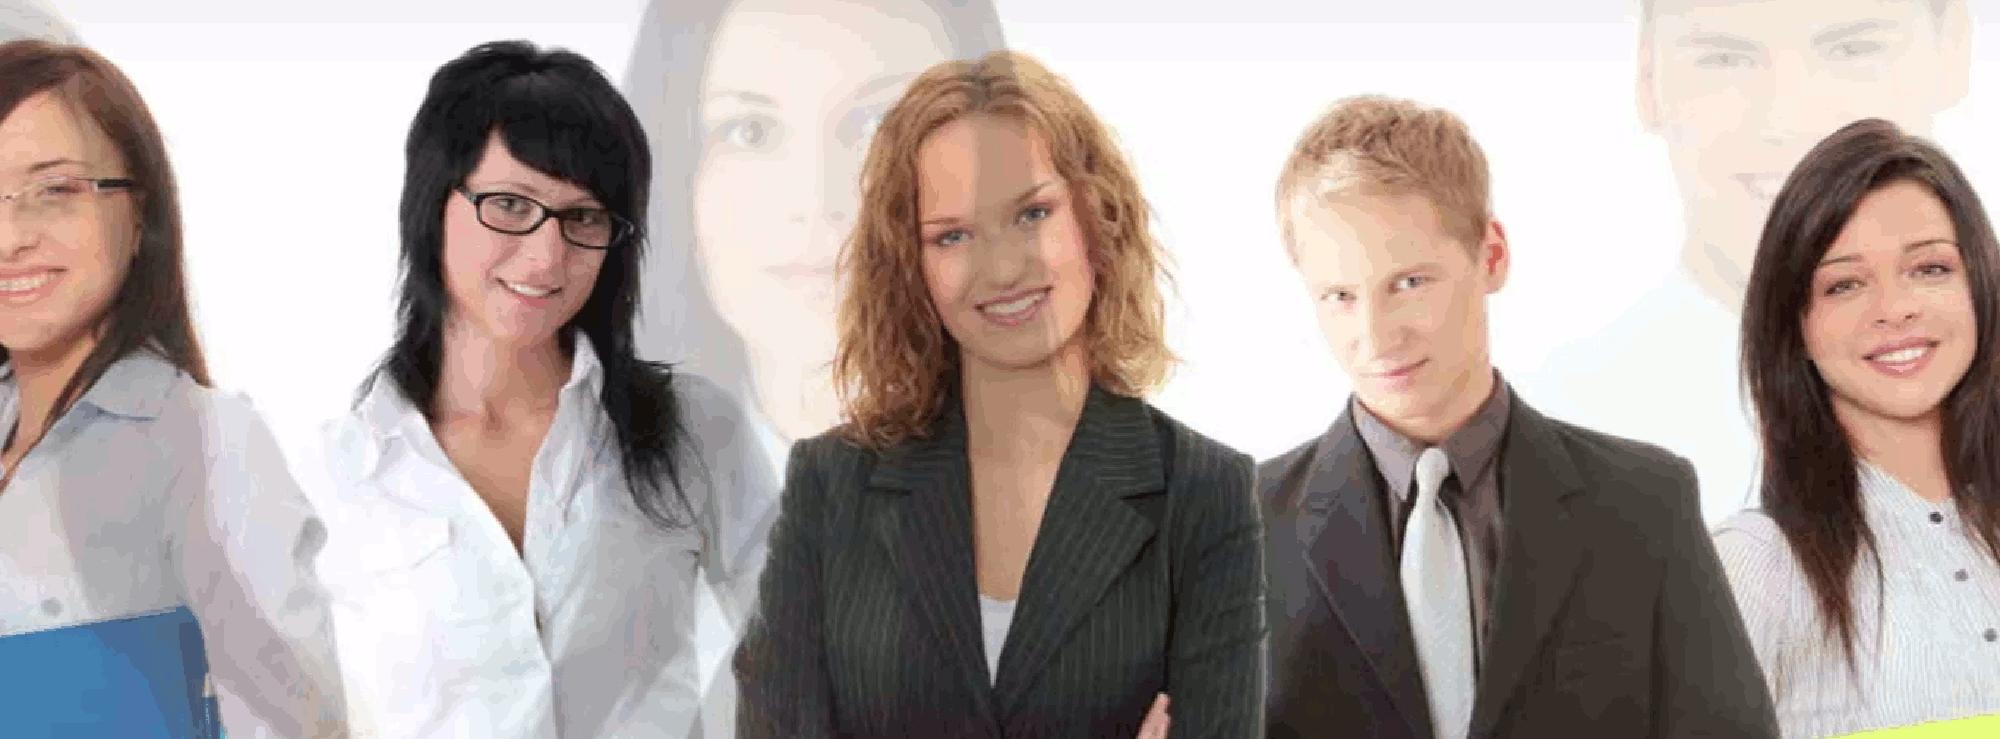 Digital Marketing Consultant Singapore - Portfolio - Video Marketing - CMI Header